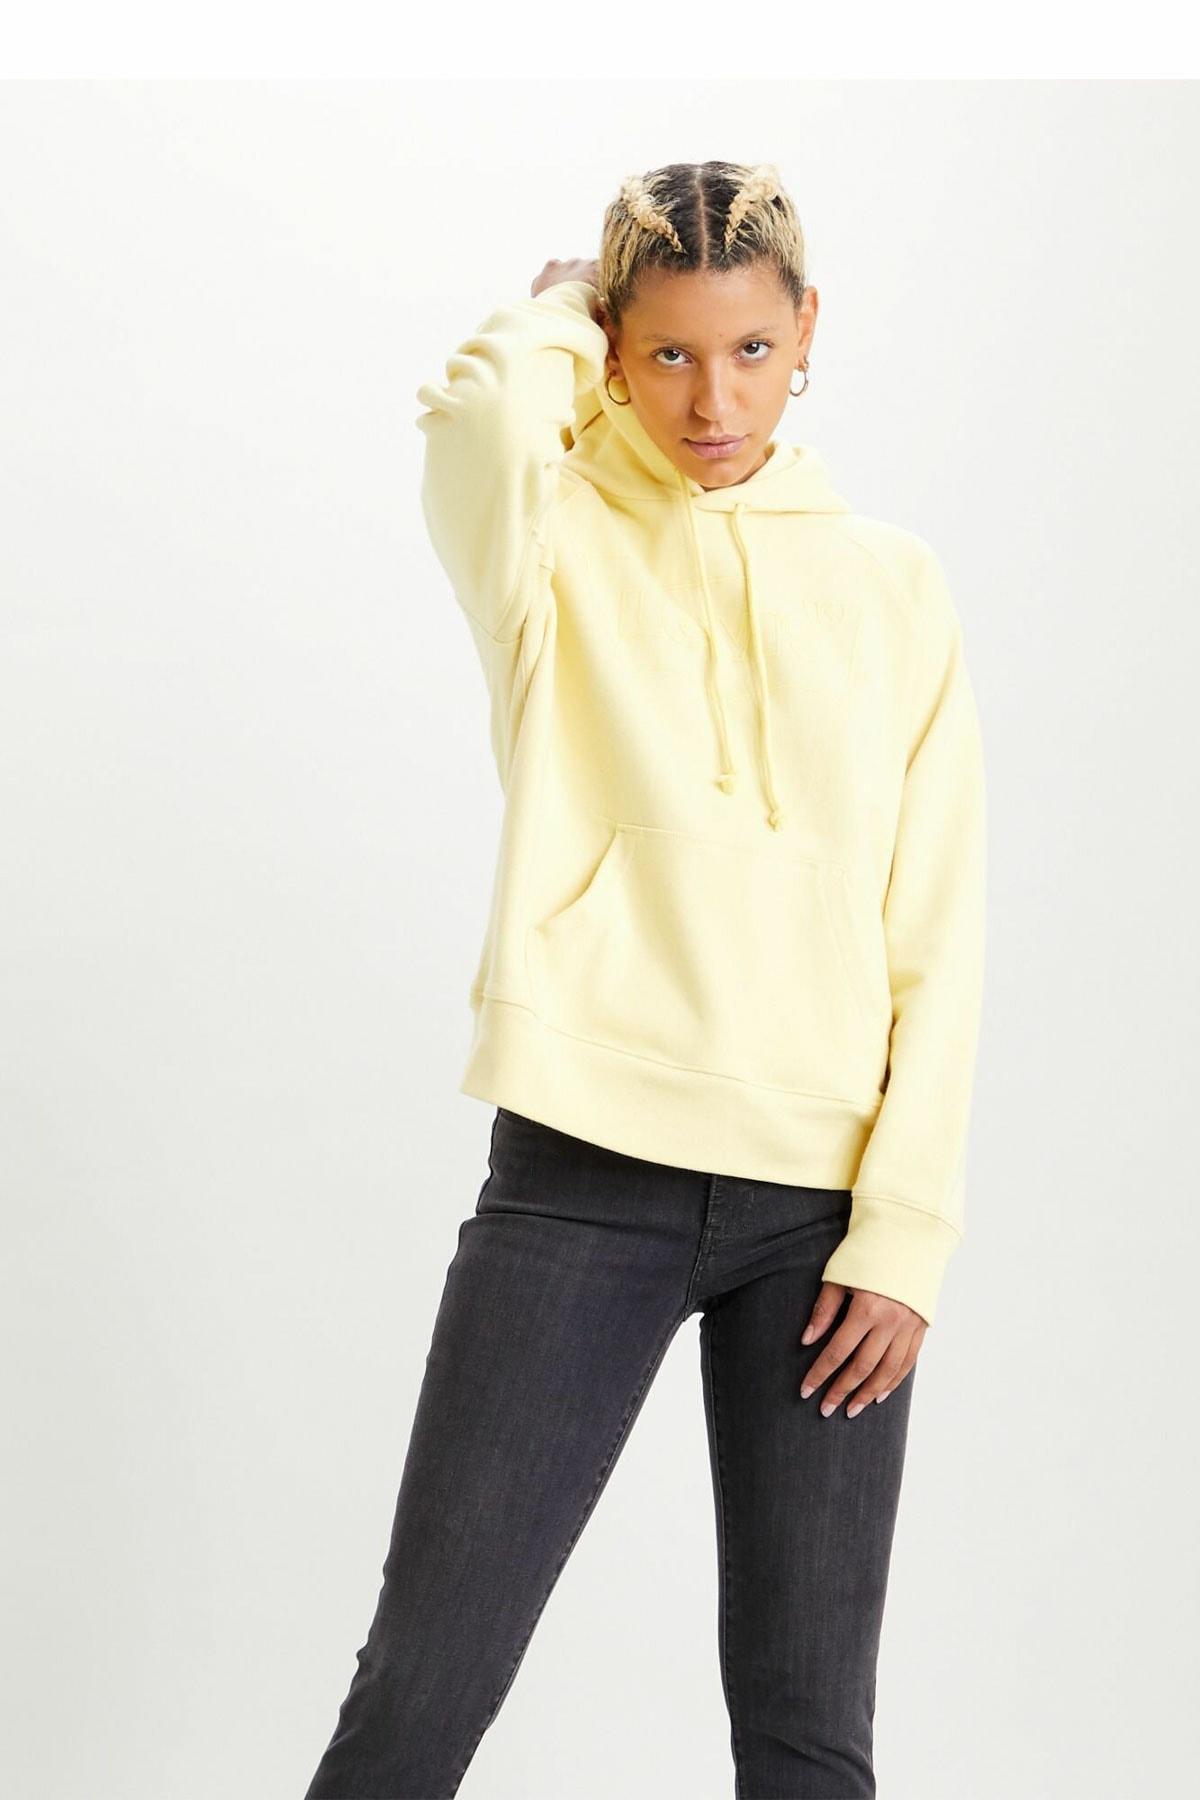 Levi's Kapüşonlu Kadın Sweatshirt 35946-0206-0238 1